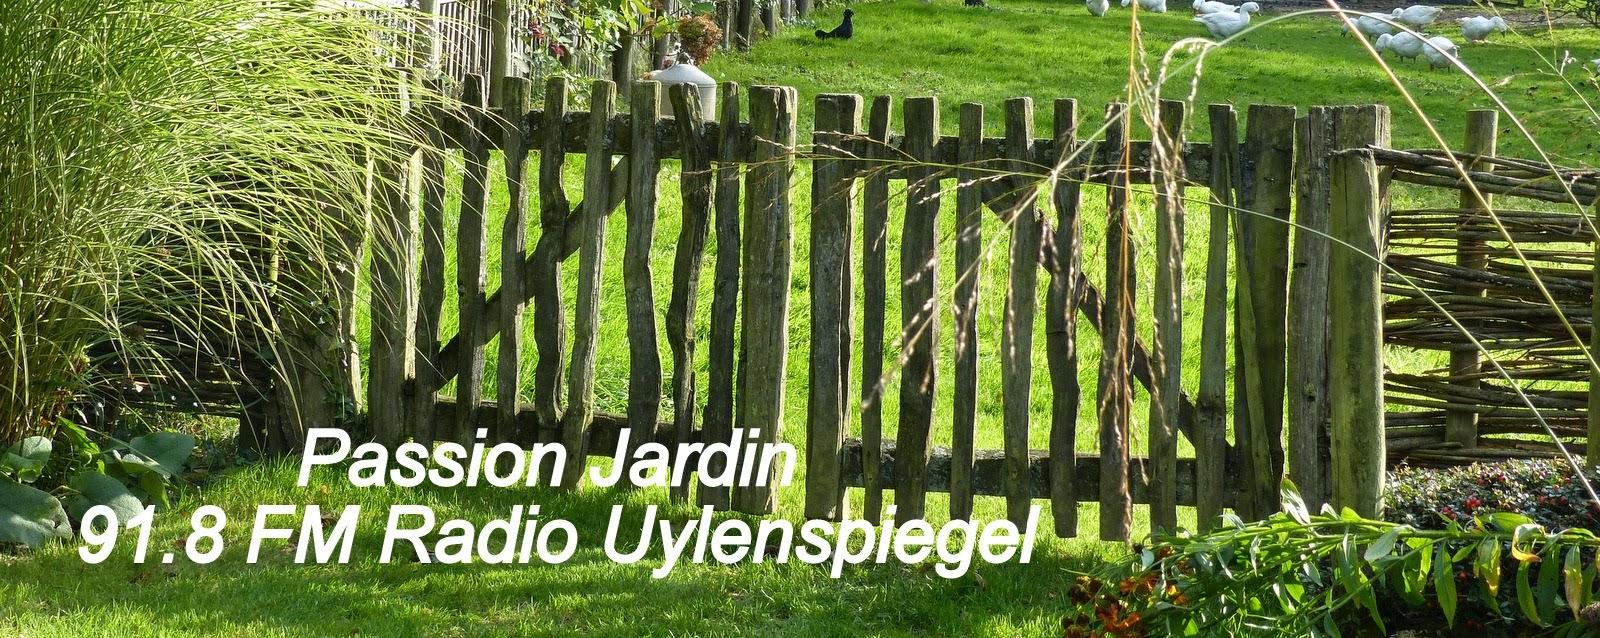 Passion Jardin